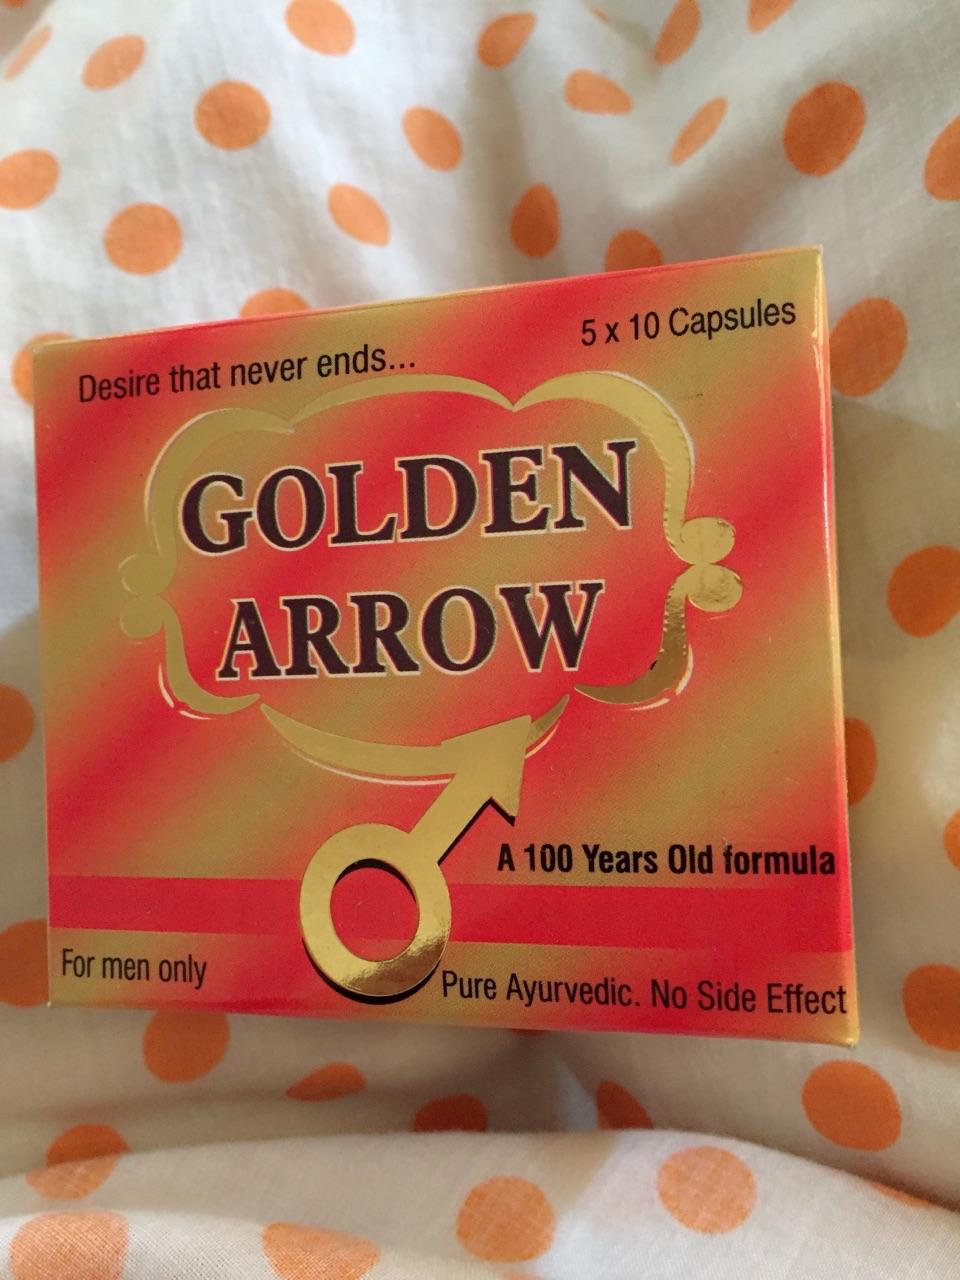 Golden Arrow Capsules